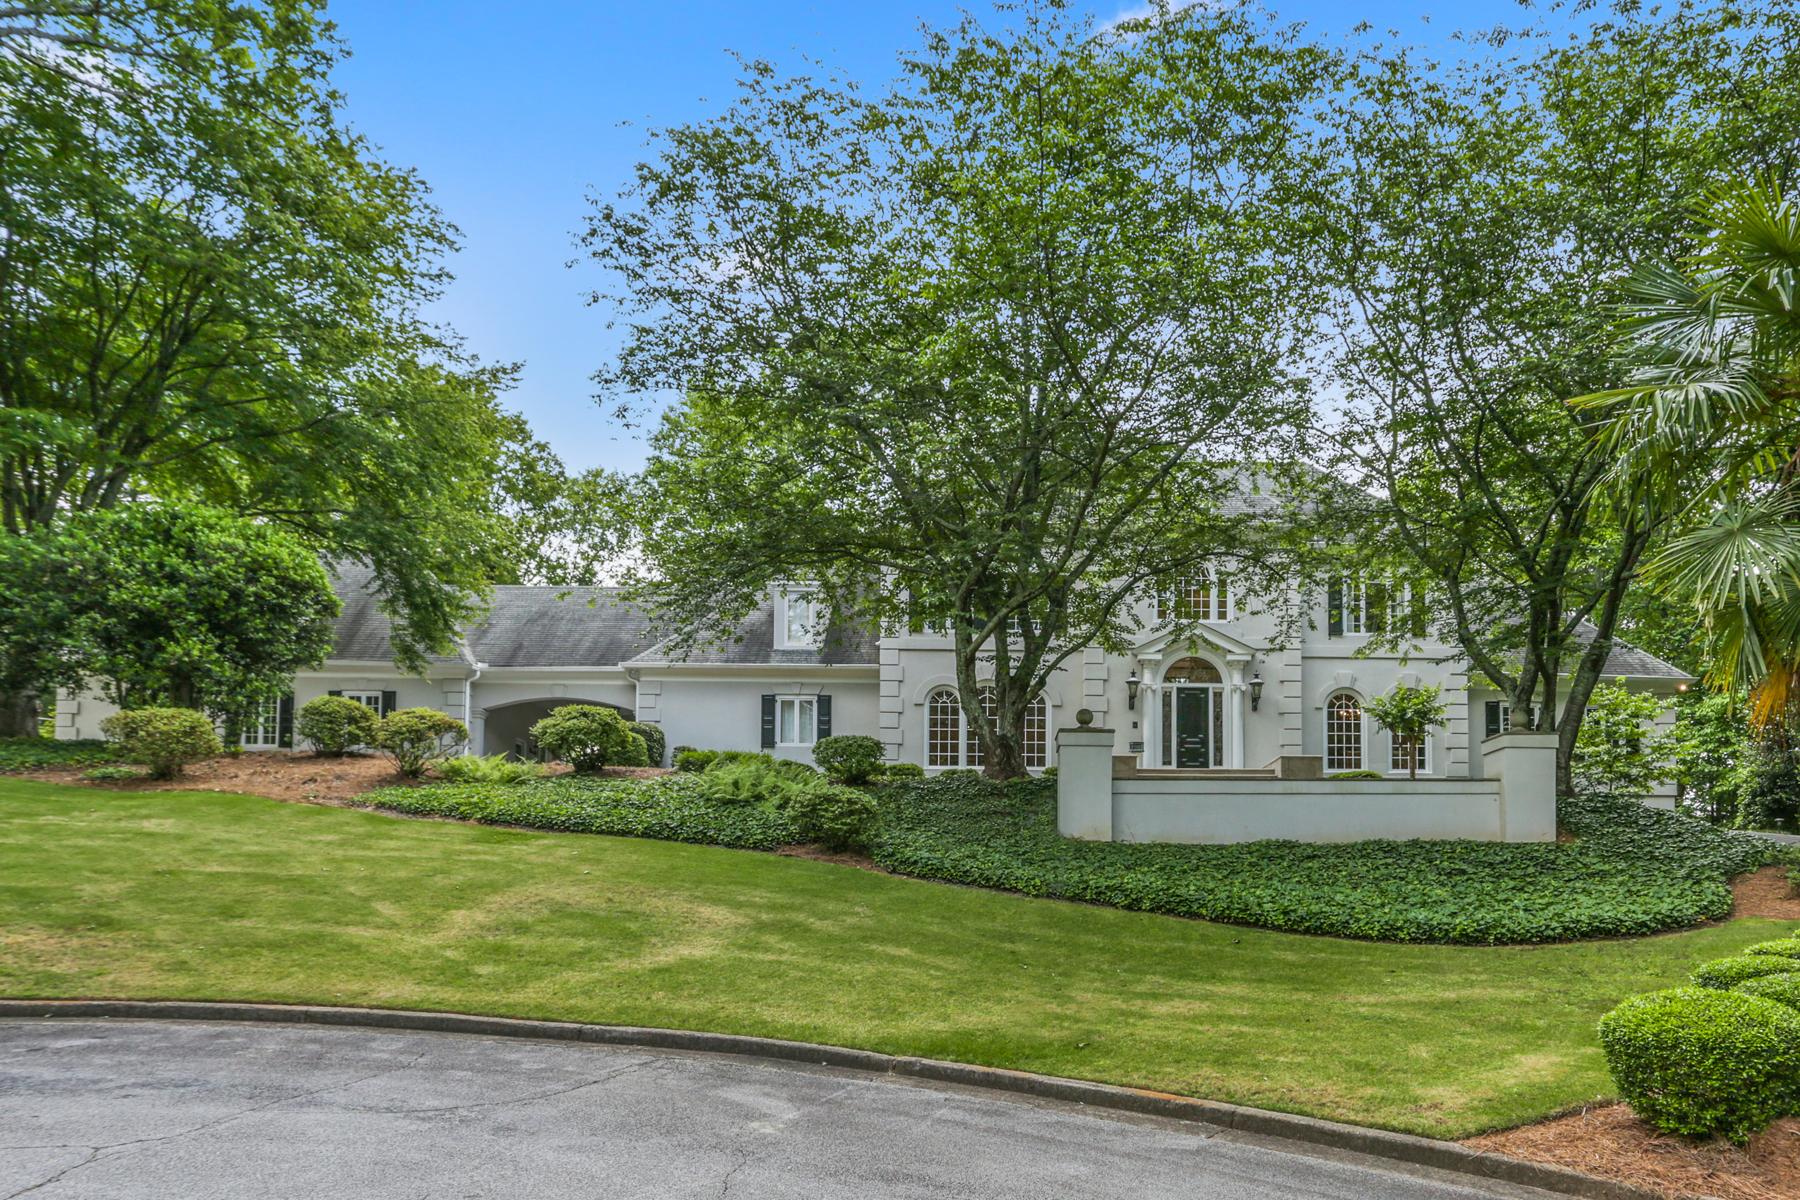 Single Family Homes por un Venta en European Style Elegance on Exclusive Cul-de-sac in Sandy Springs 125 Parc Du Chateau Court Atlanta, Georgia 30327 Estados Unidos